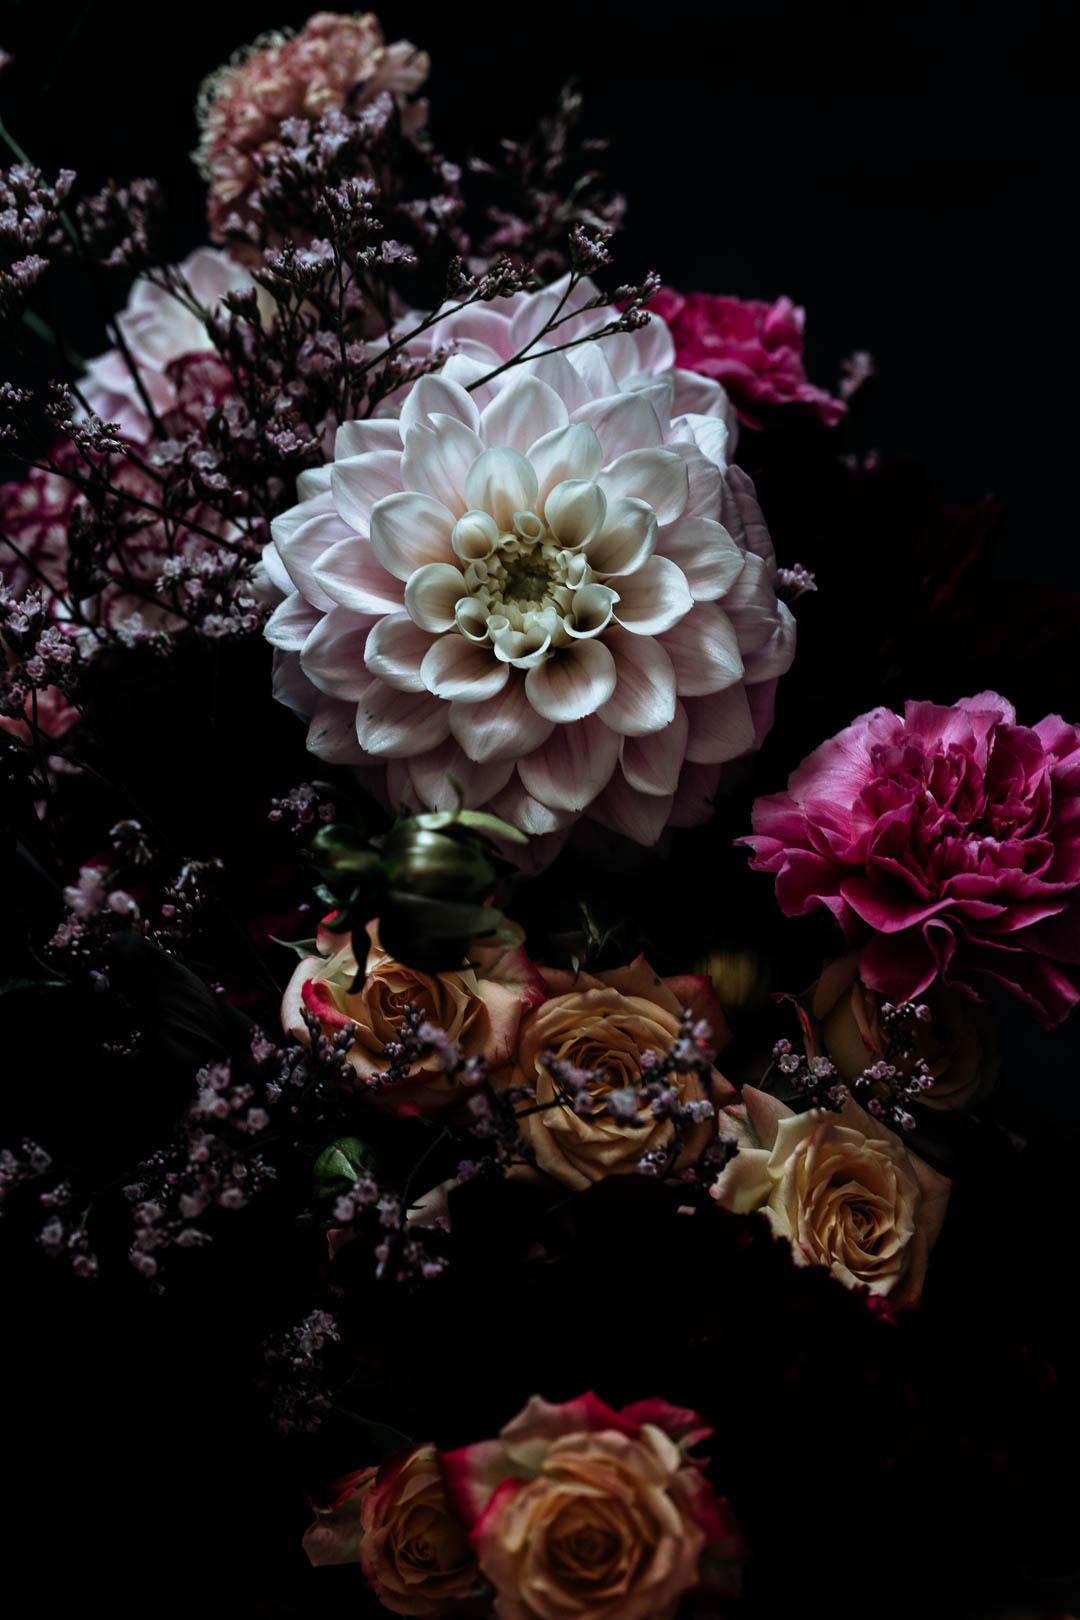 Dahlias - Aster & Bloom bouquet small (19 of 20).jpg